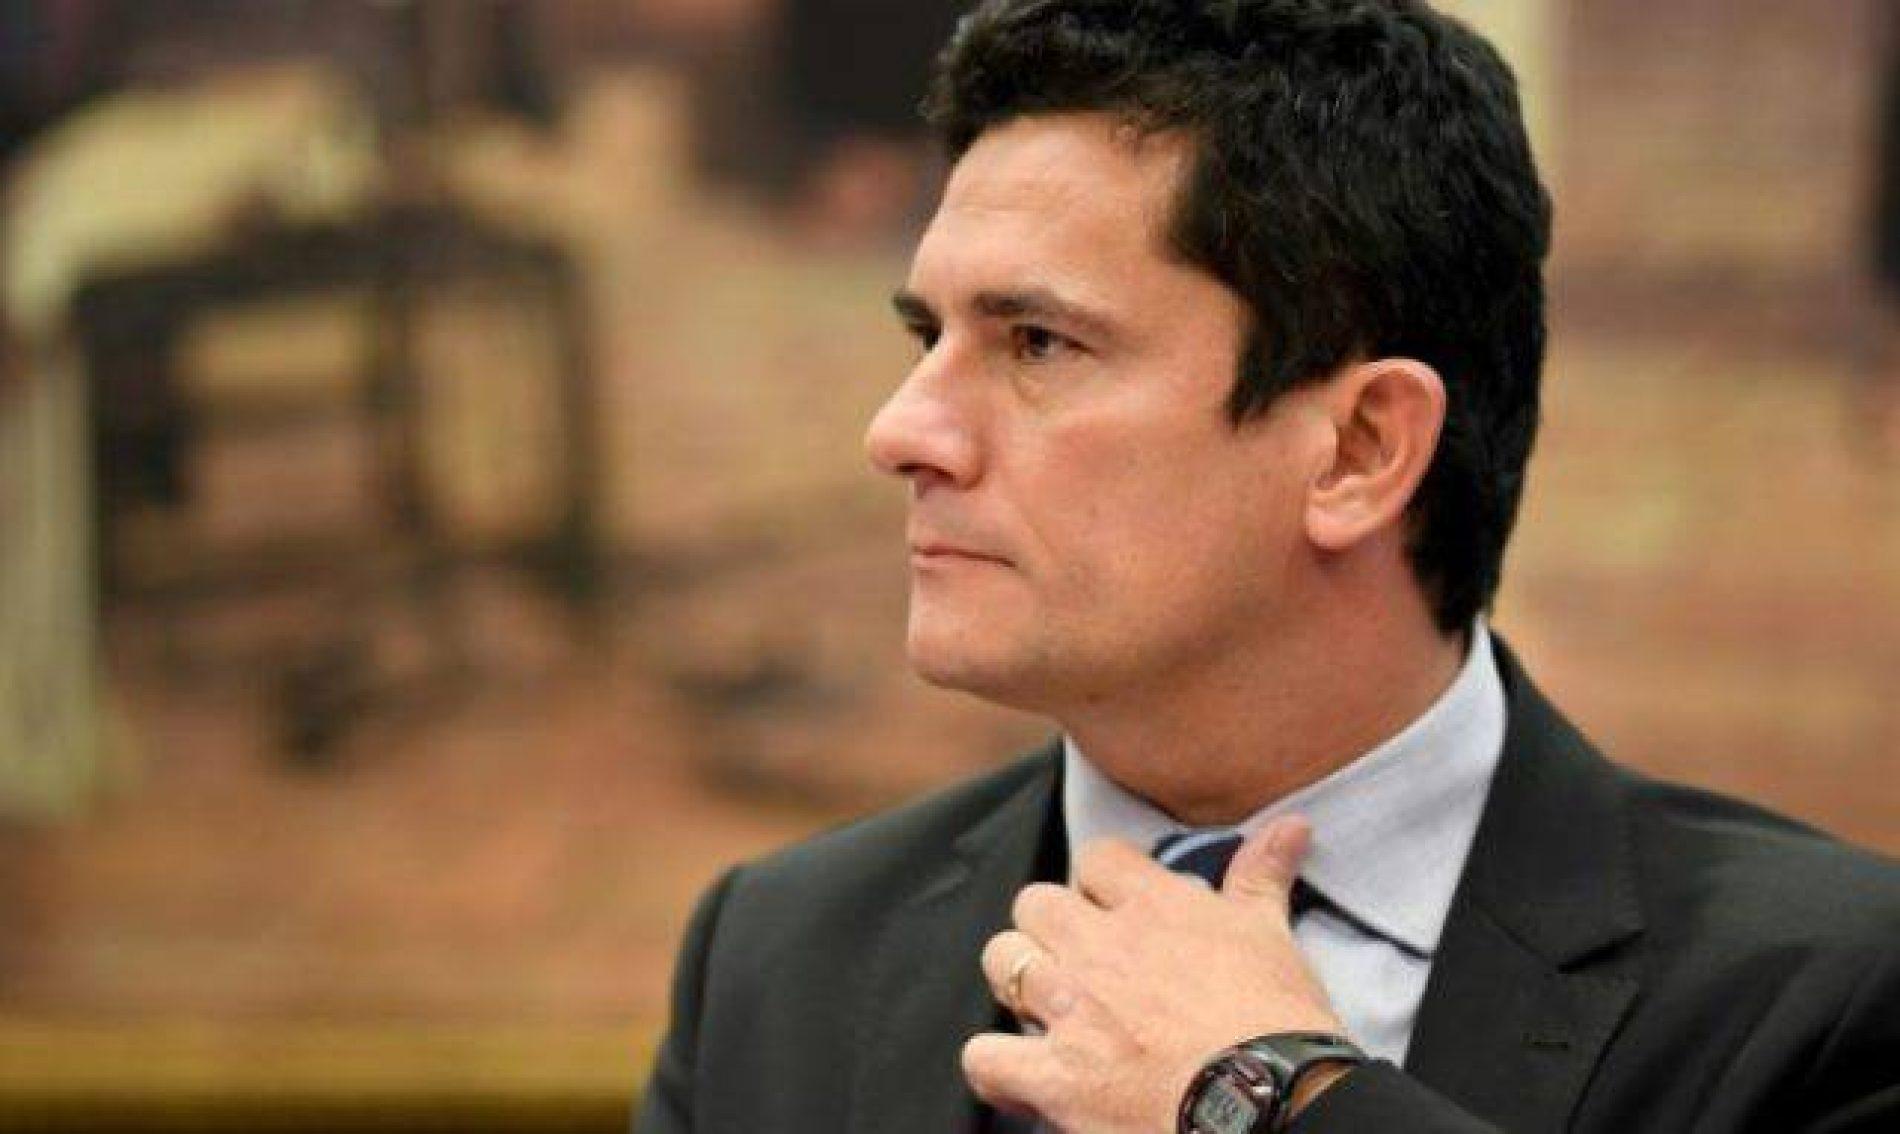 Moro compartilha provas da Lava Jato com a Receita Federal